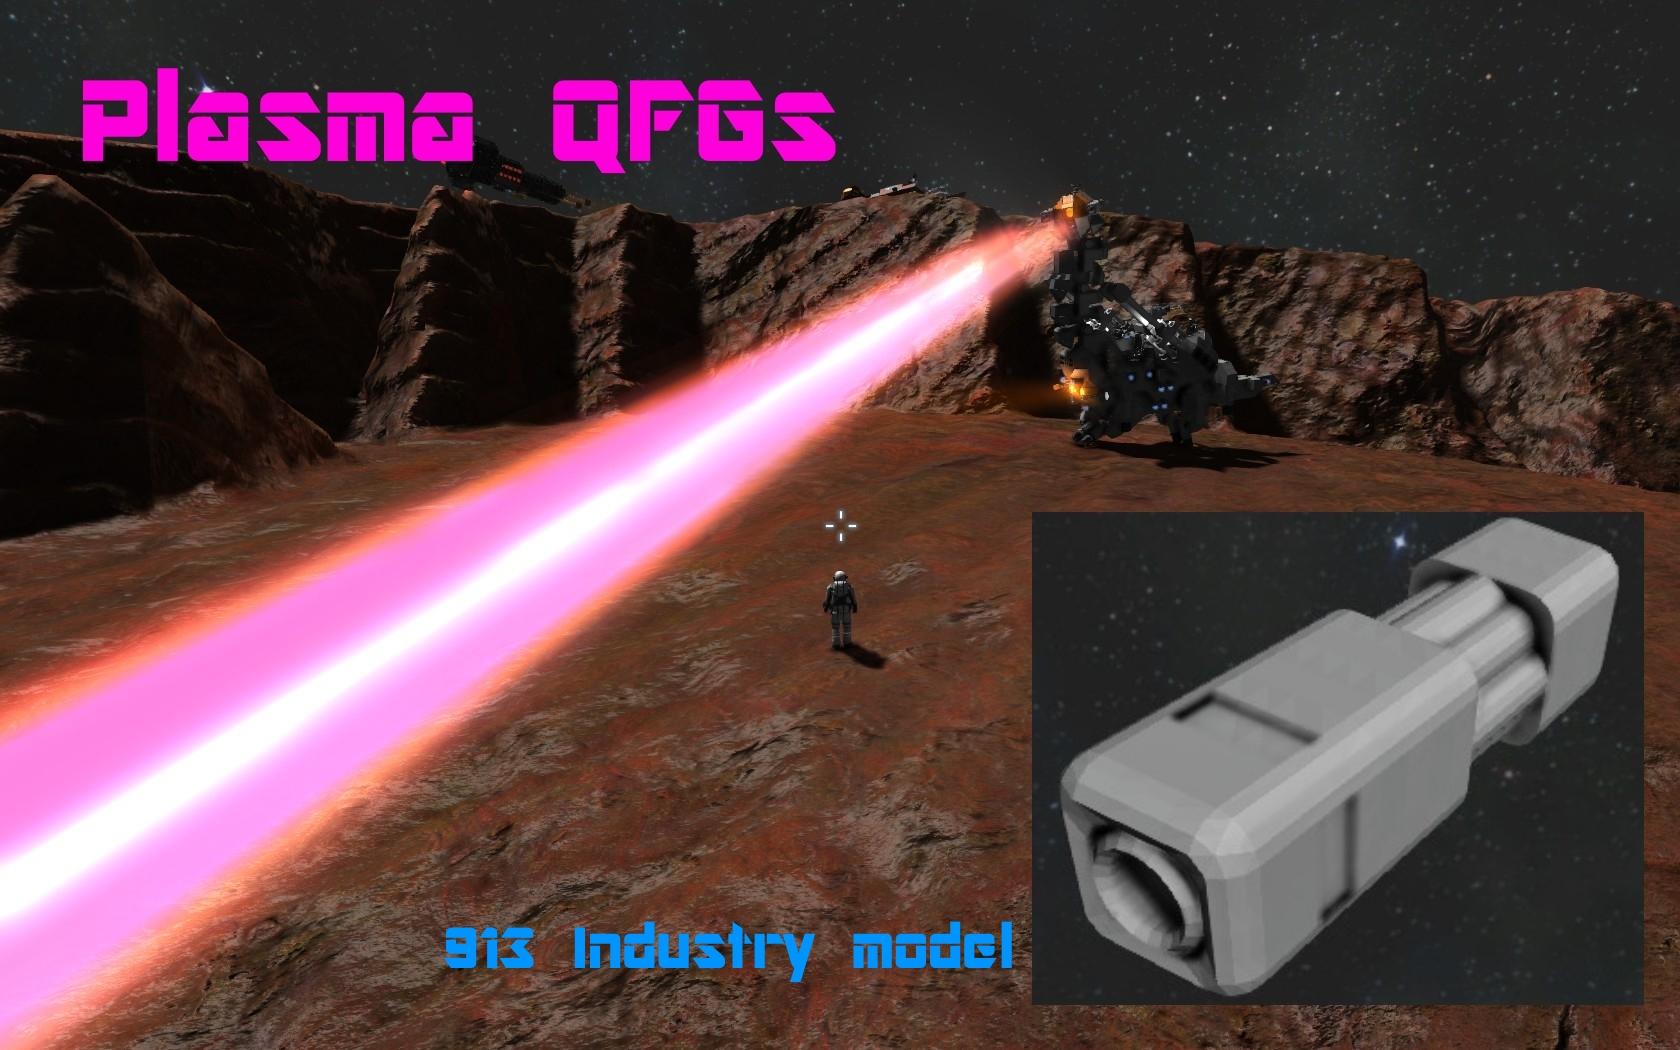 [DX11] Plasma QFG [913 Industry]